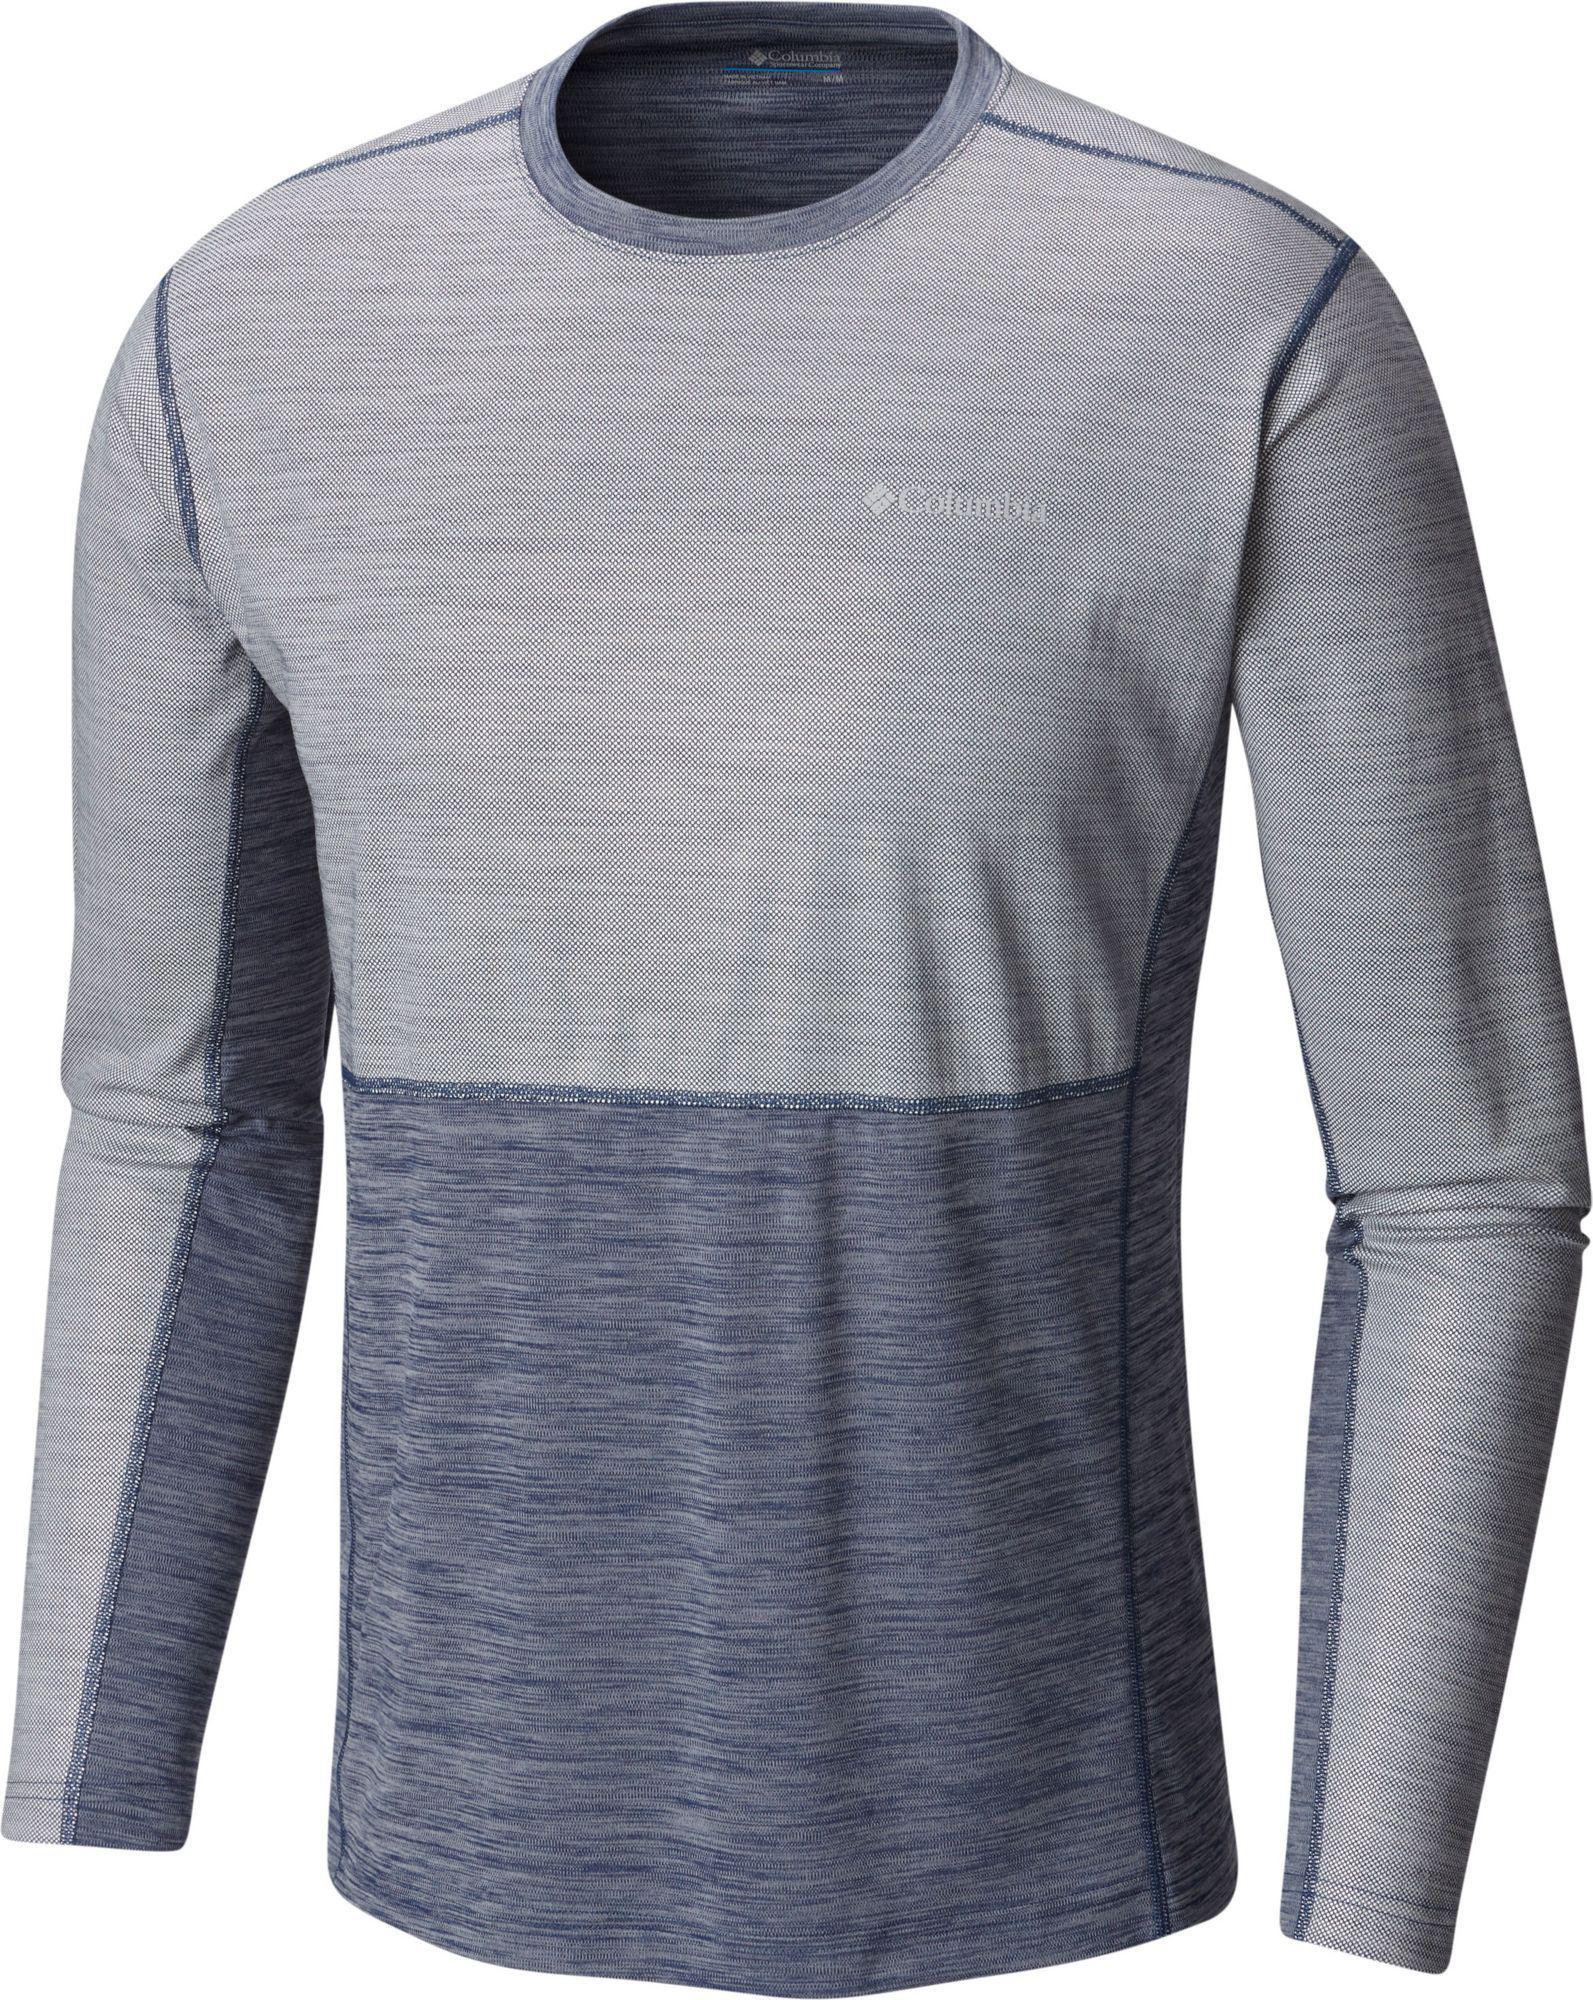 ed67ad4c23b Lyst - Columbia Solar Chill Long Sleeve Shirt in Gray for Men